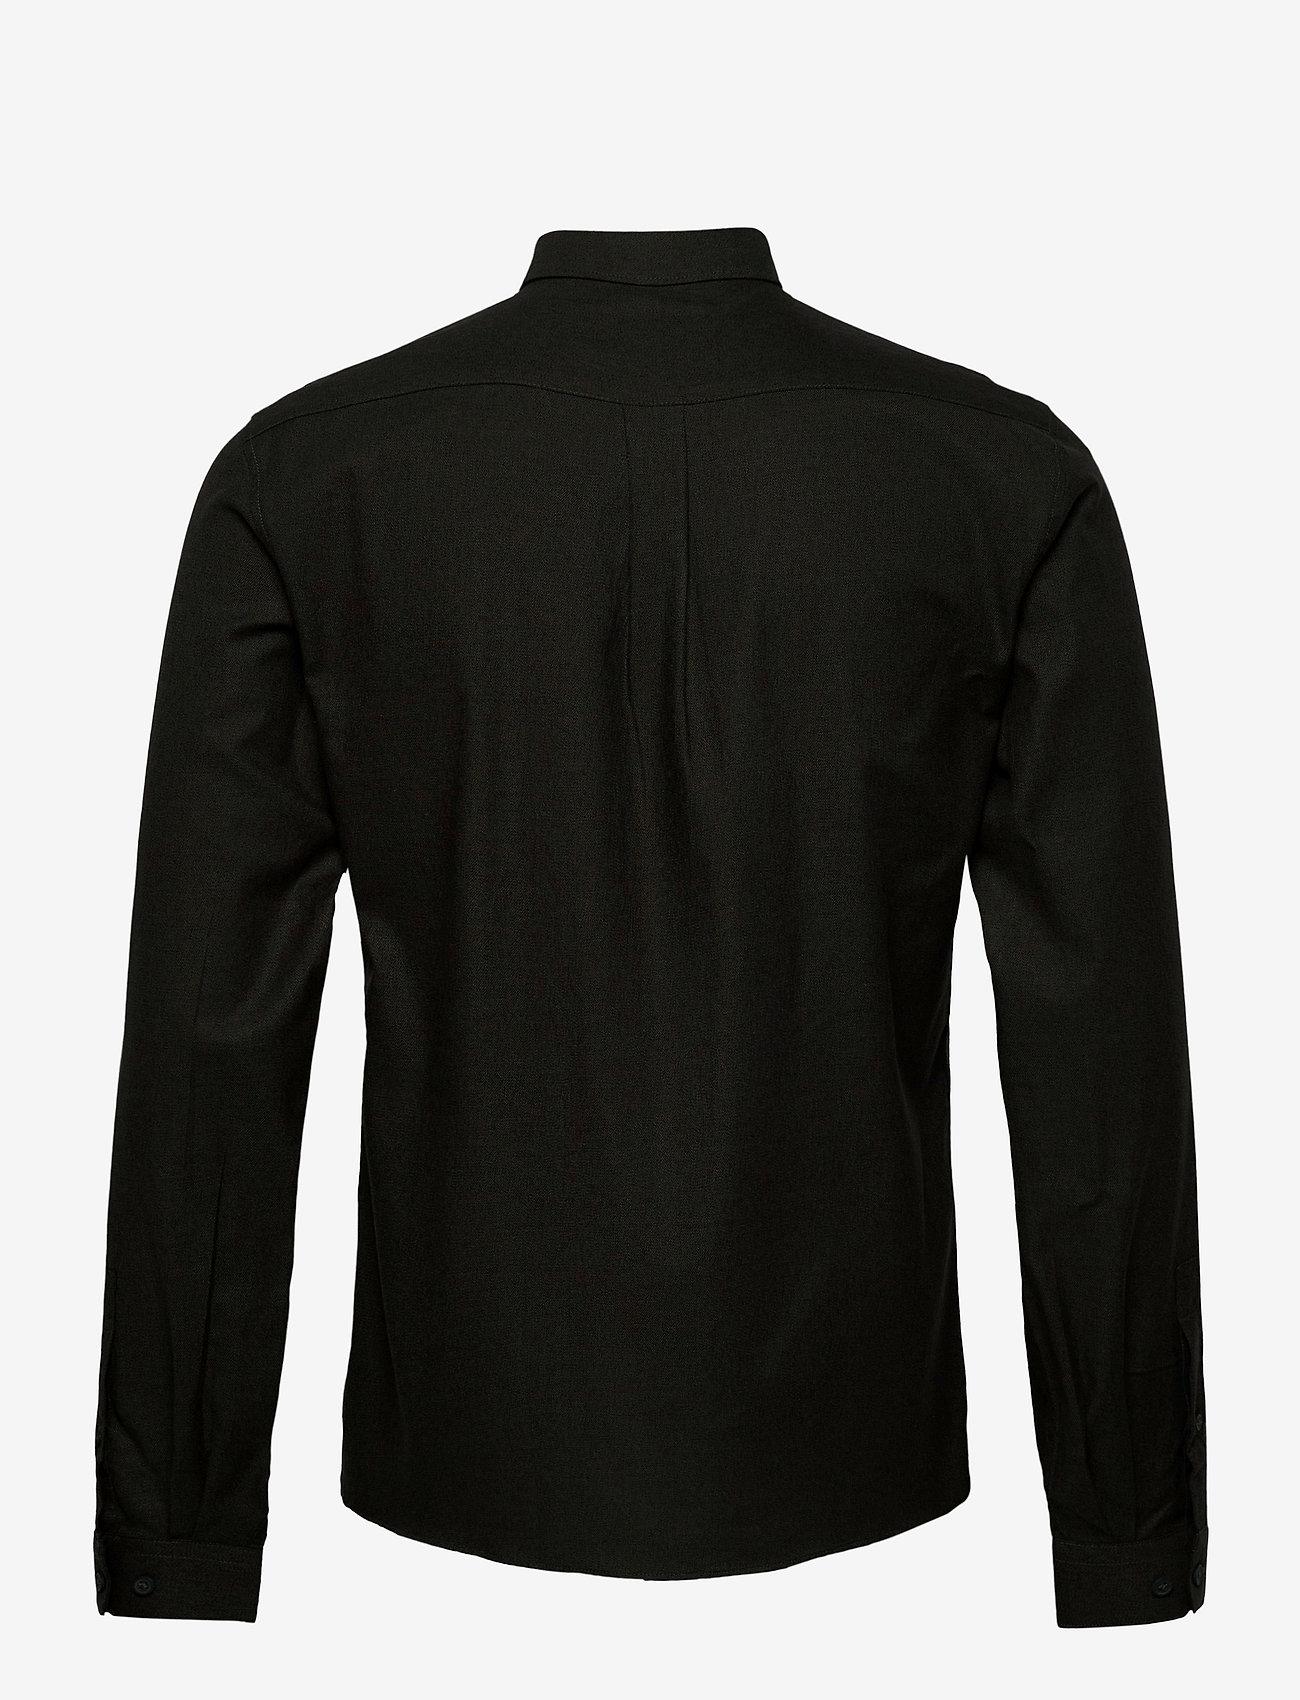 Lindbergh - Mouliné stretch shirt L/S - basic shirts - army - 1